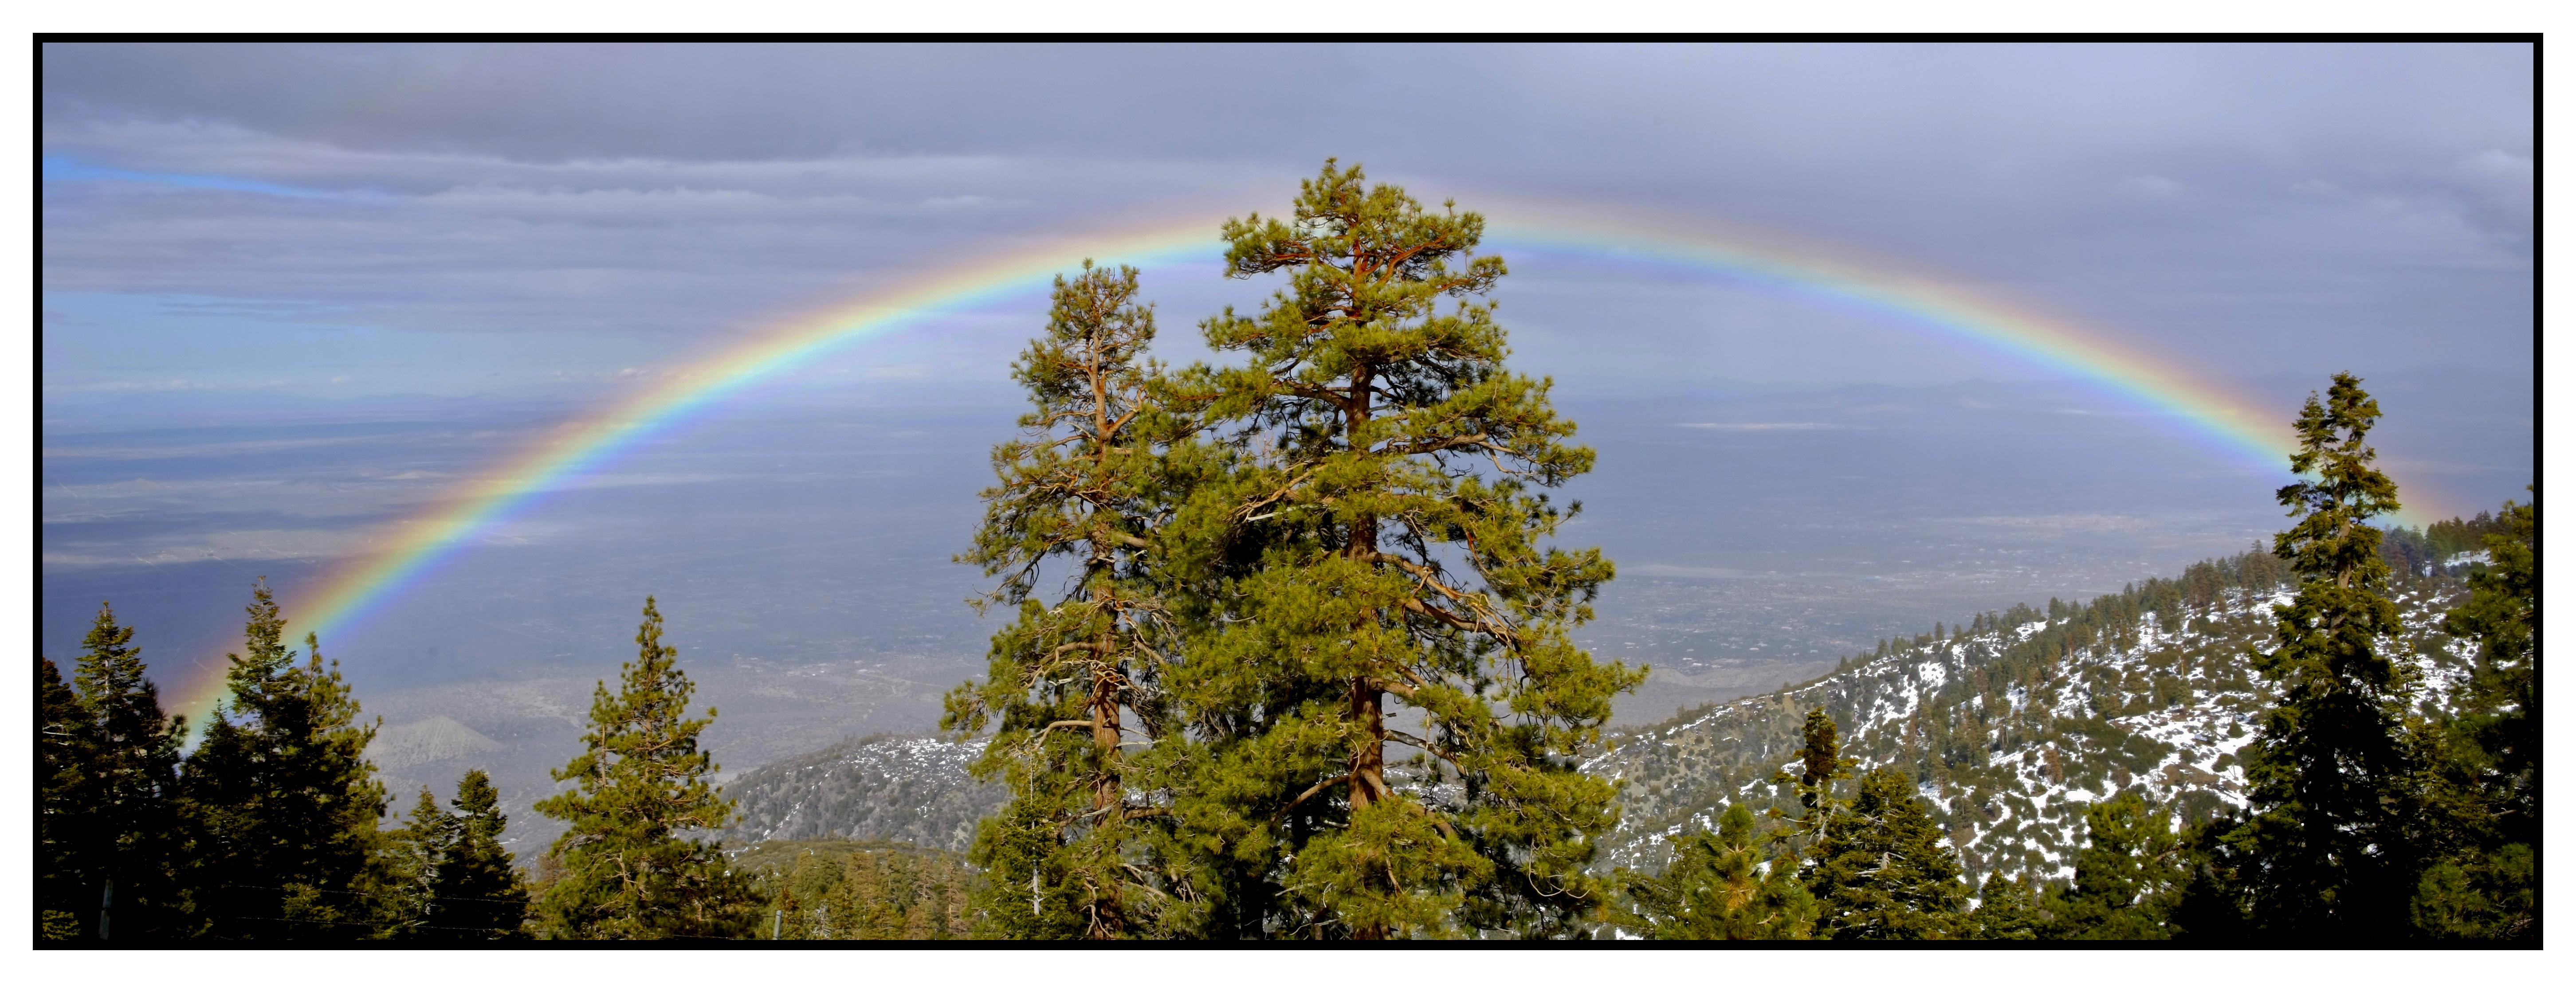 Rainbow Nasa